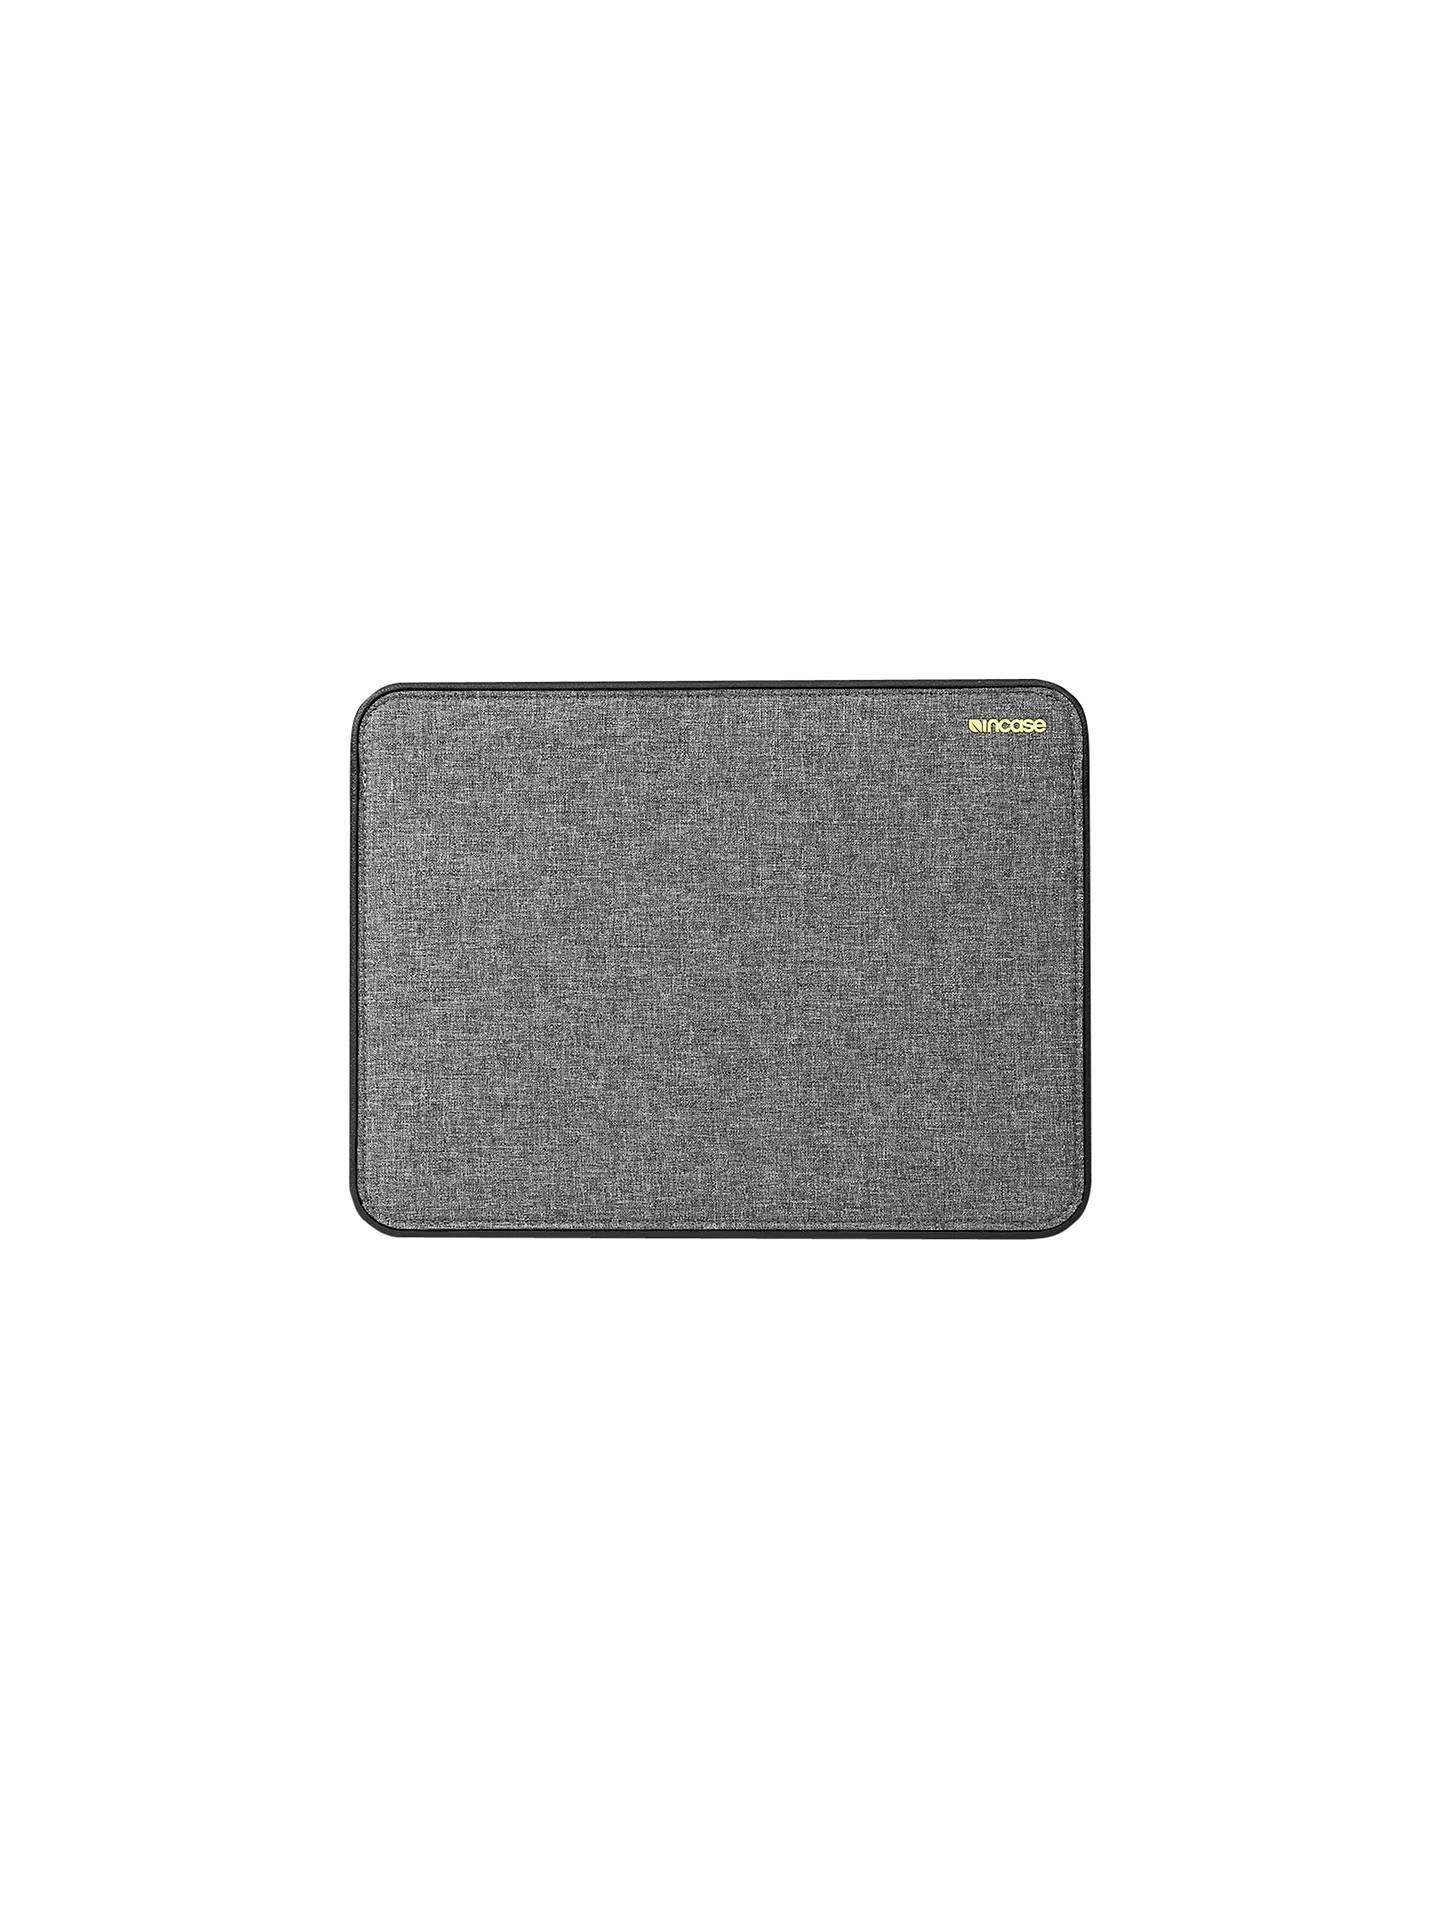 huge discount 4a14c a3442 Incase ICON Sleeve for MacBook Pro/Pro Retina/Pro TouchBar 13